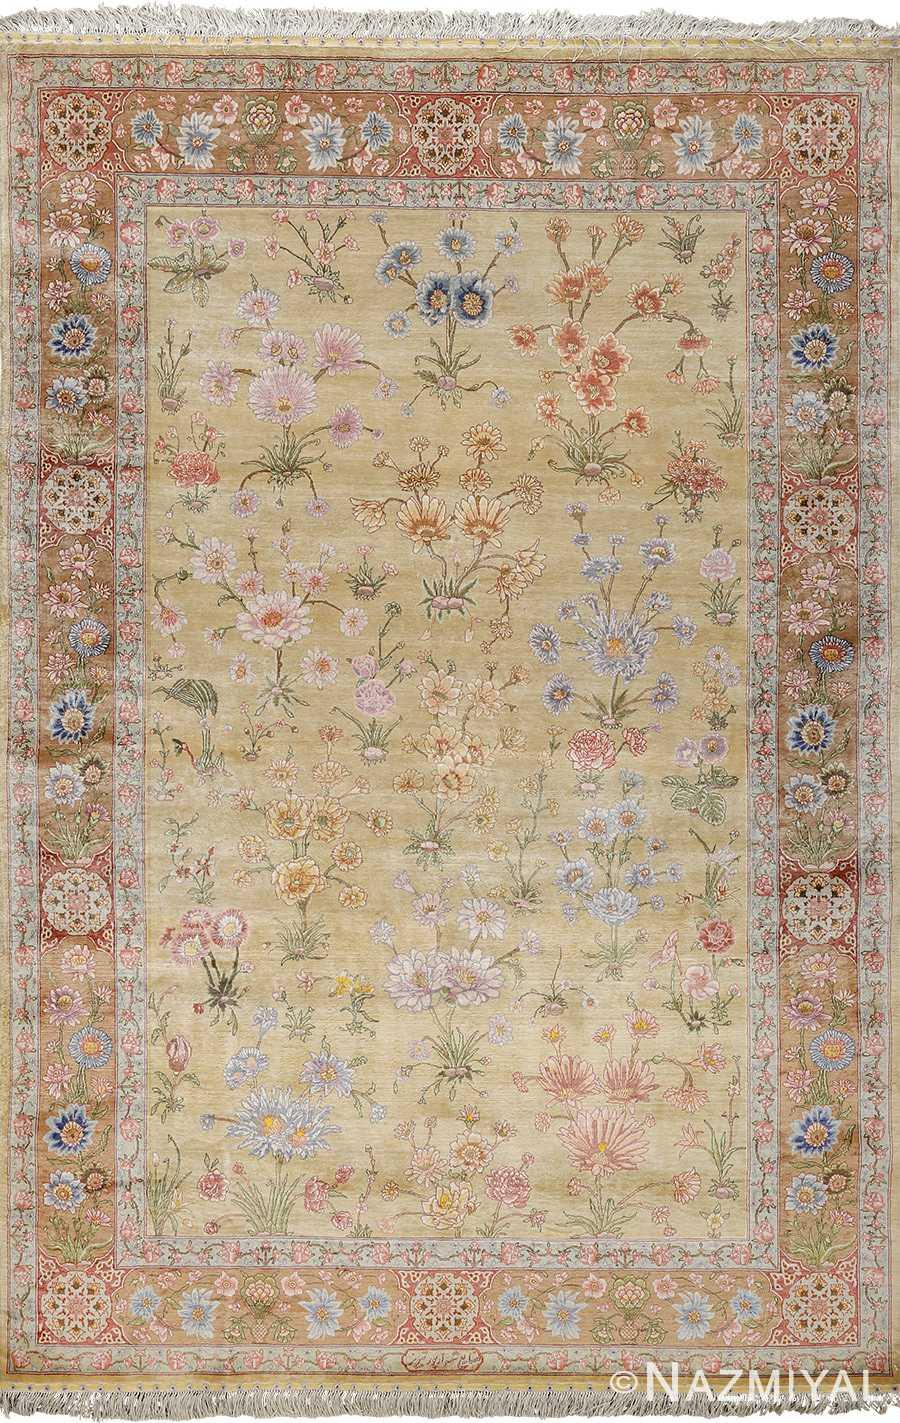 silk shahsavarpour design vintage tabriz persian rug 51162 Nazmiyal